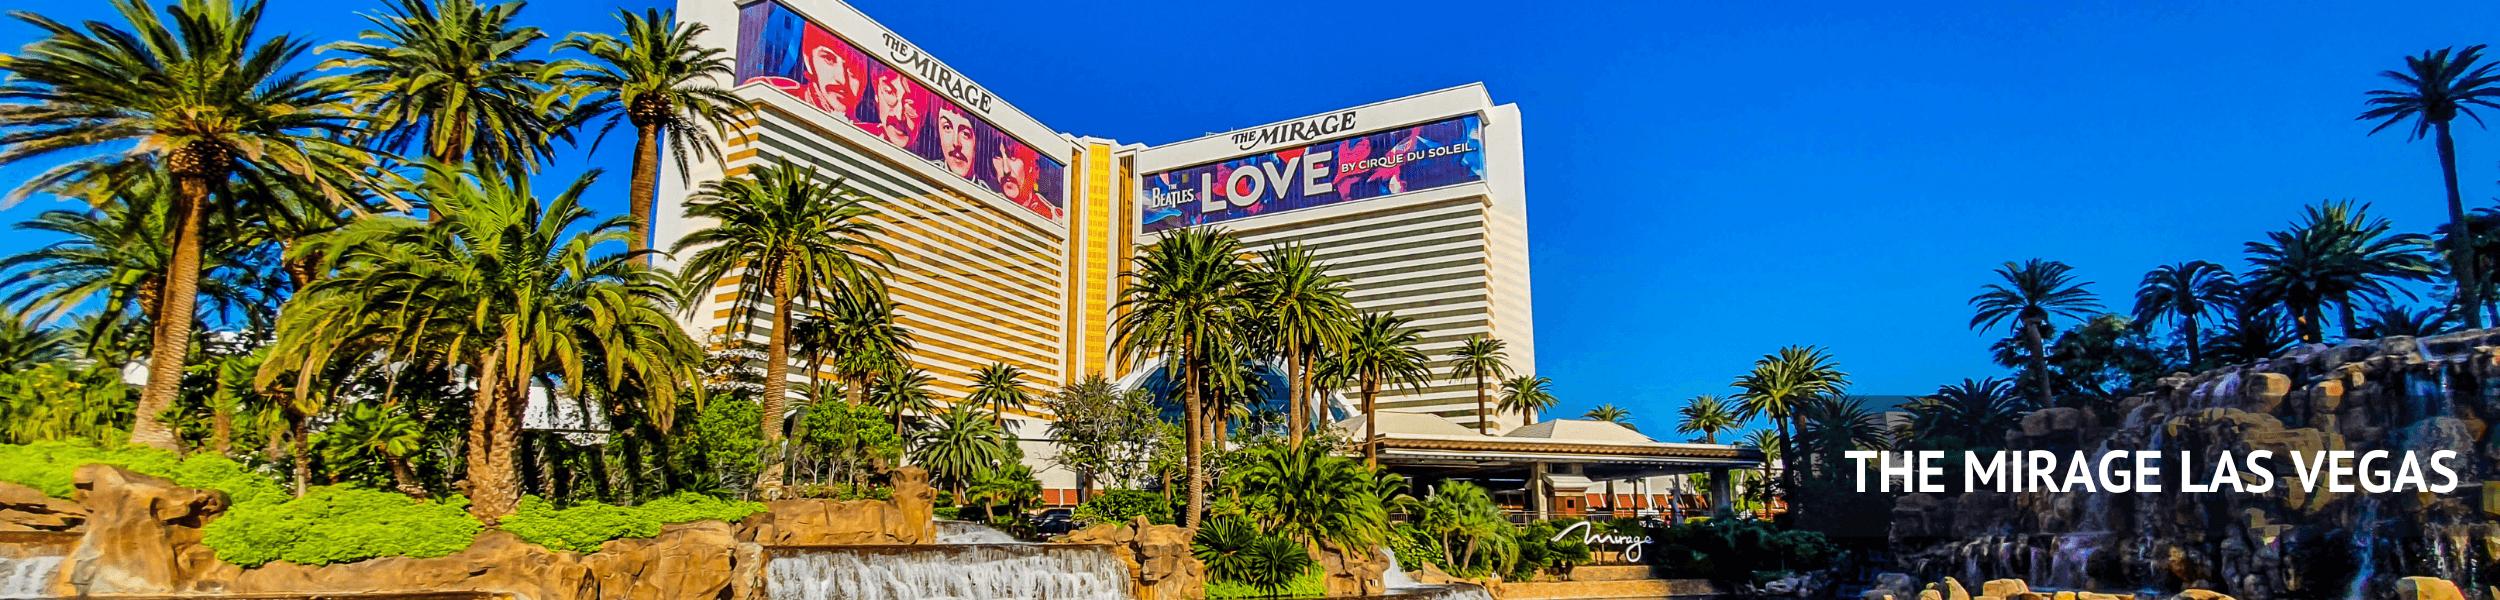 The Mirage Las Vegas Review